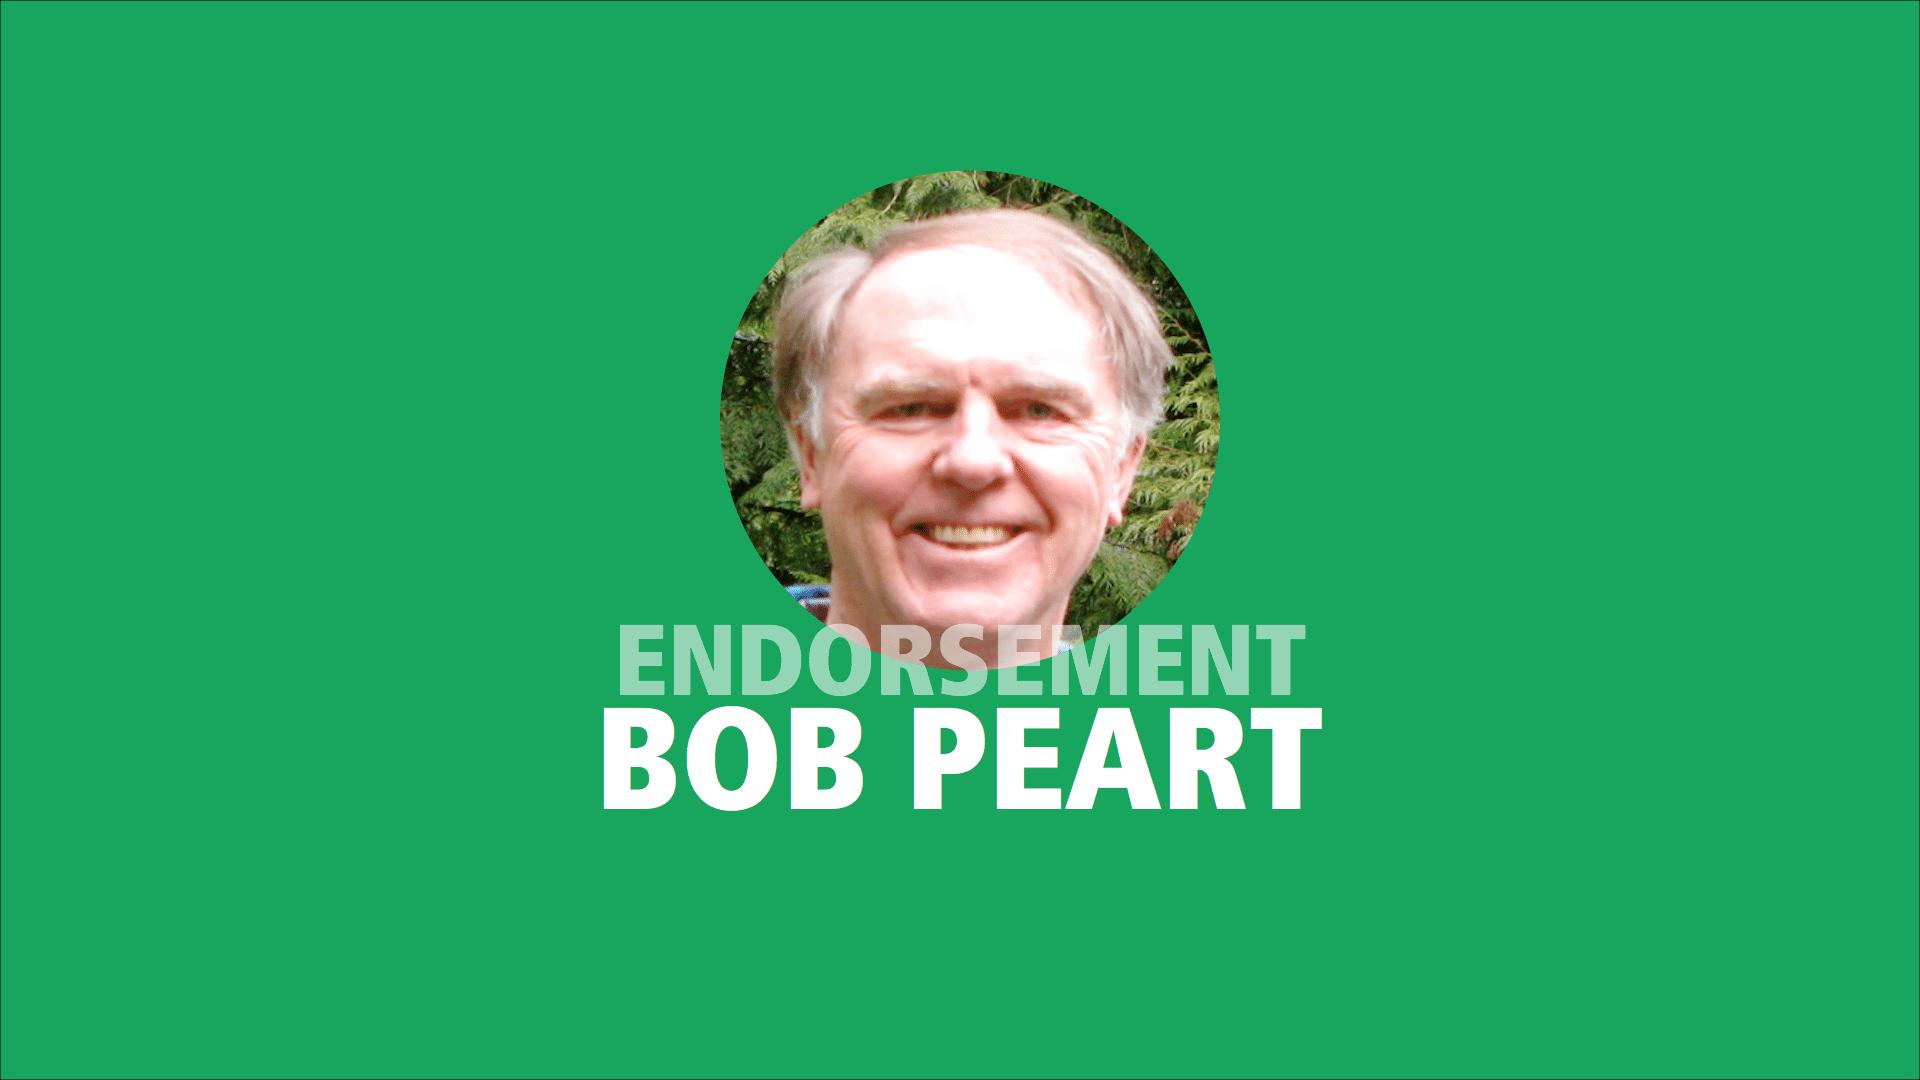 Bob Peart endorses Adam Olsen